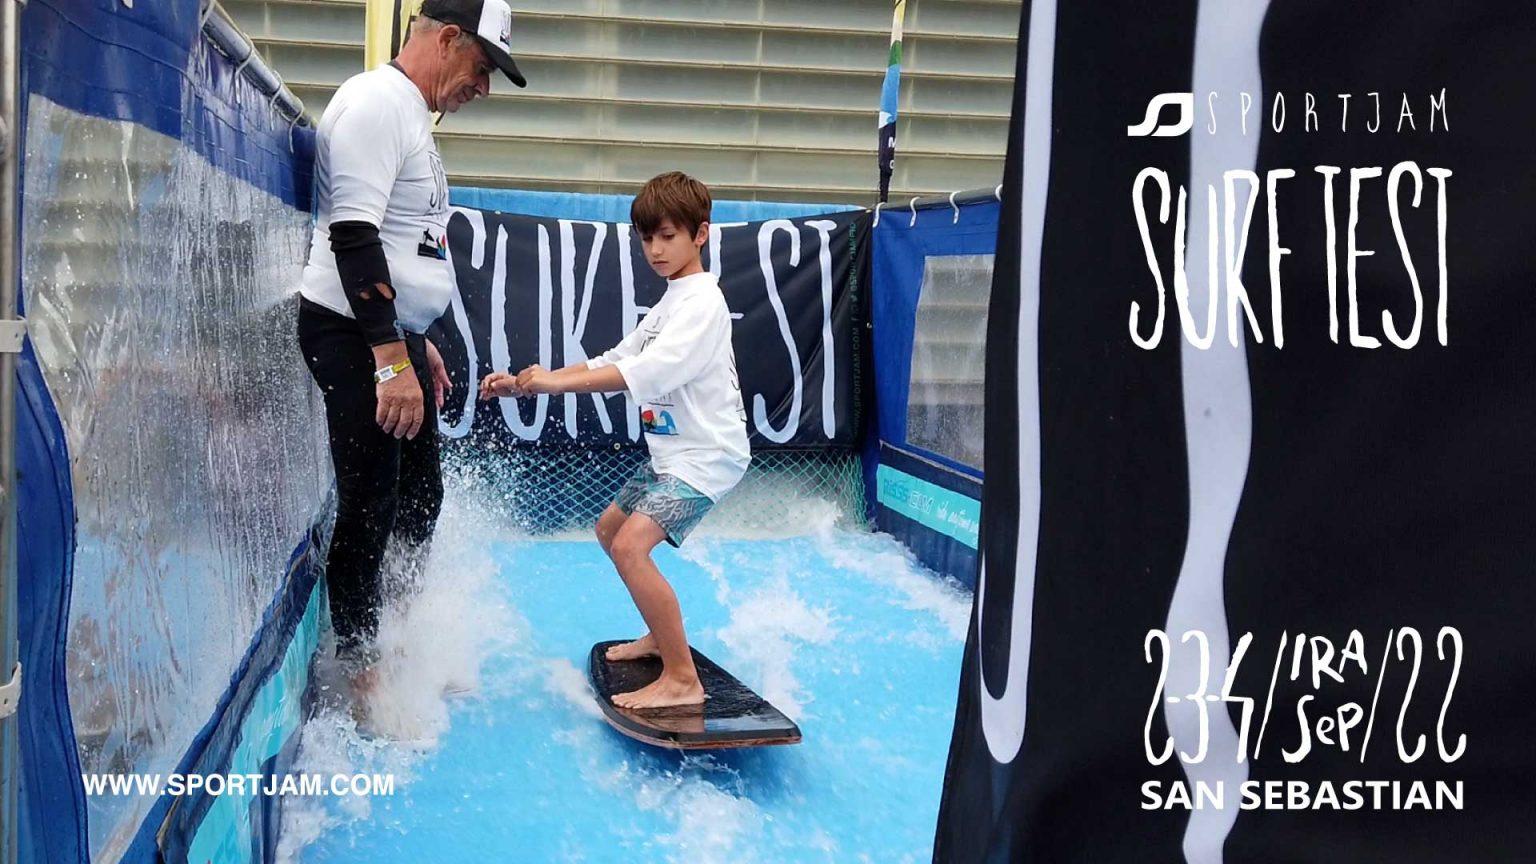 HOGO-BOX-SPORTJAM-SURFTEST-2021